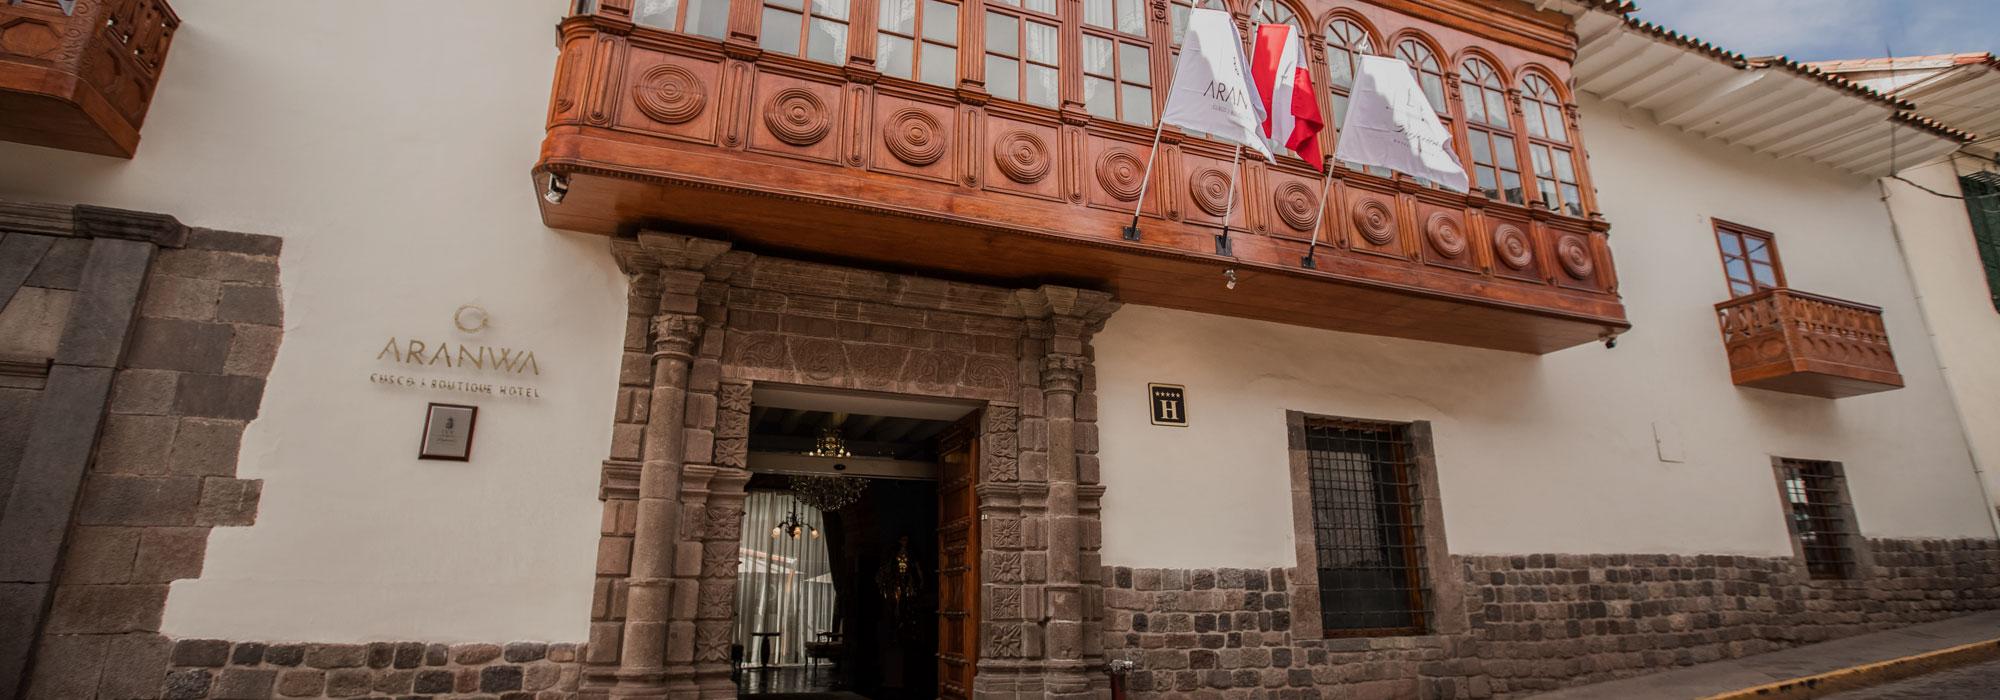 Aranwa Cusco Botique Hotel